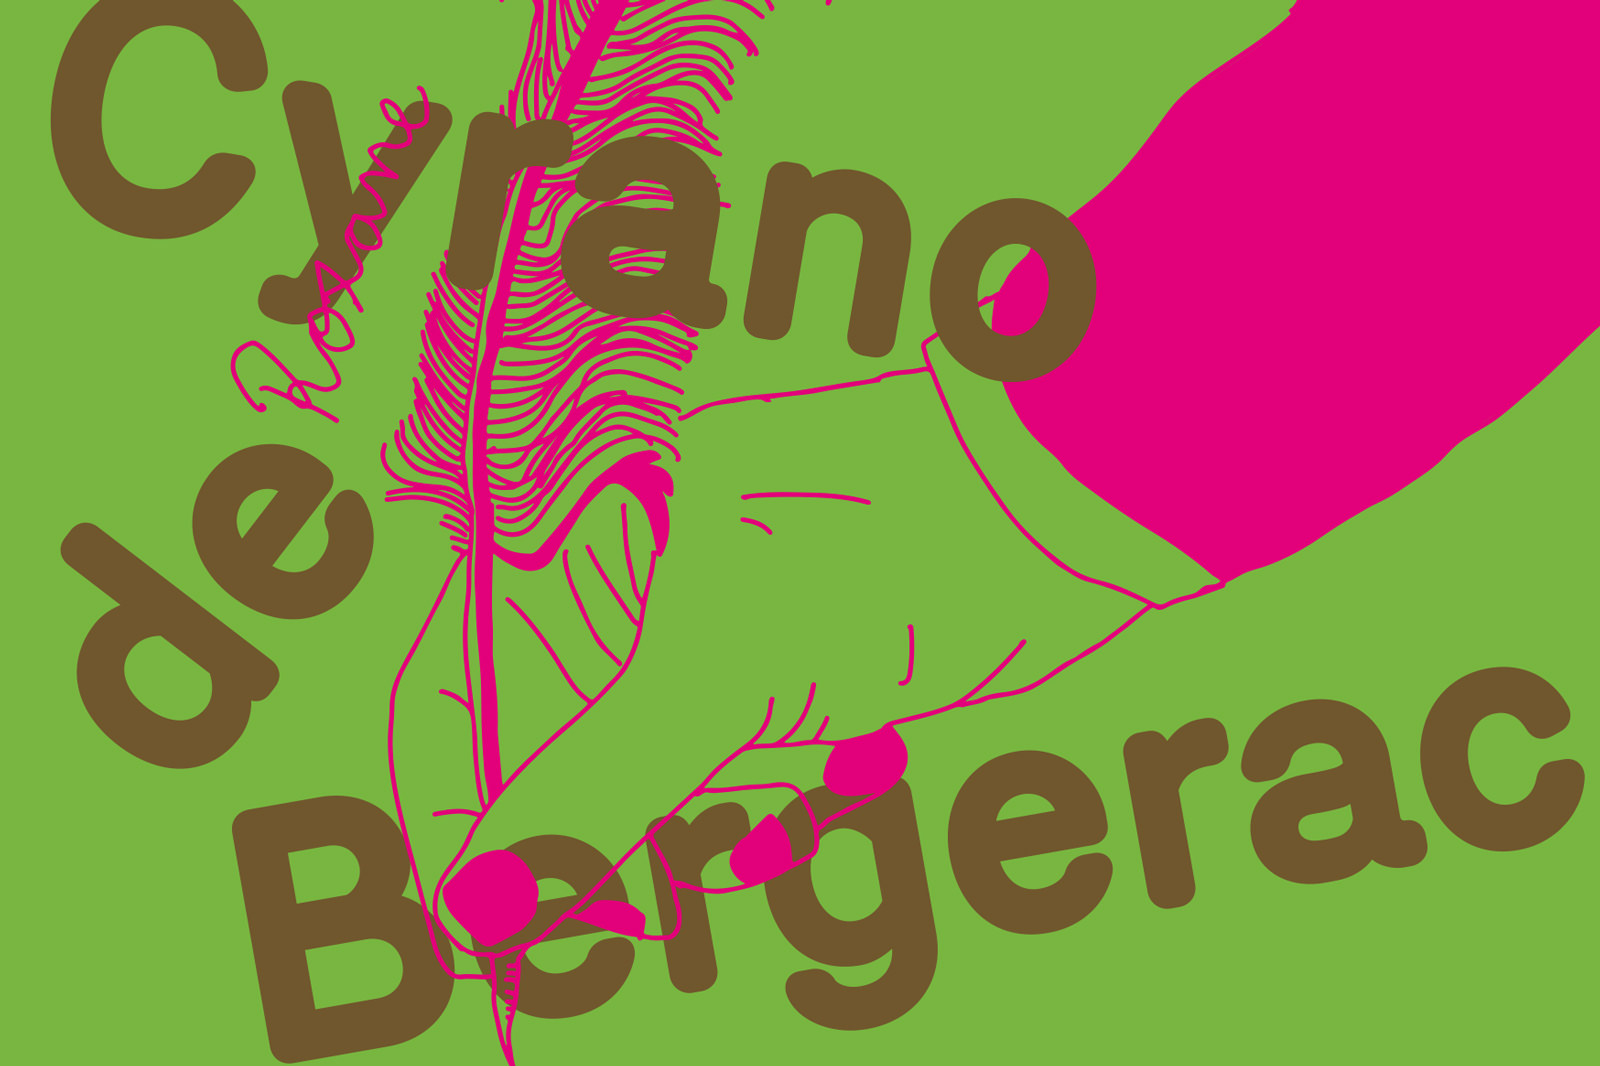 Cyrano de Bergerac - Drama am Theater im e.novum in Lüneburg